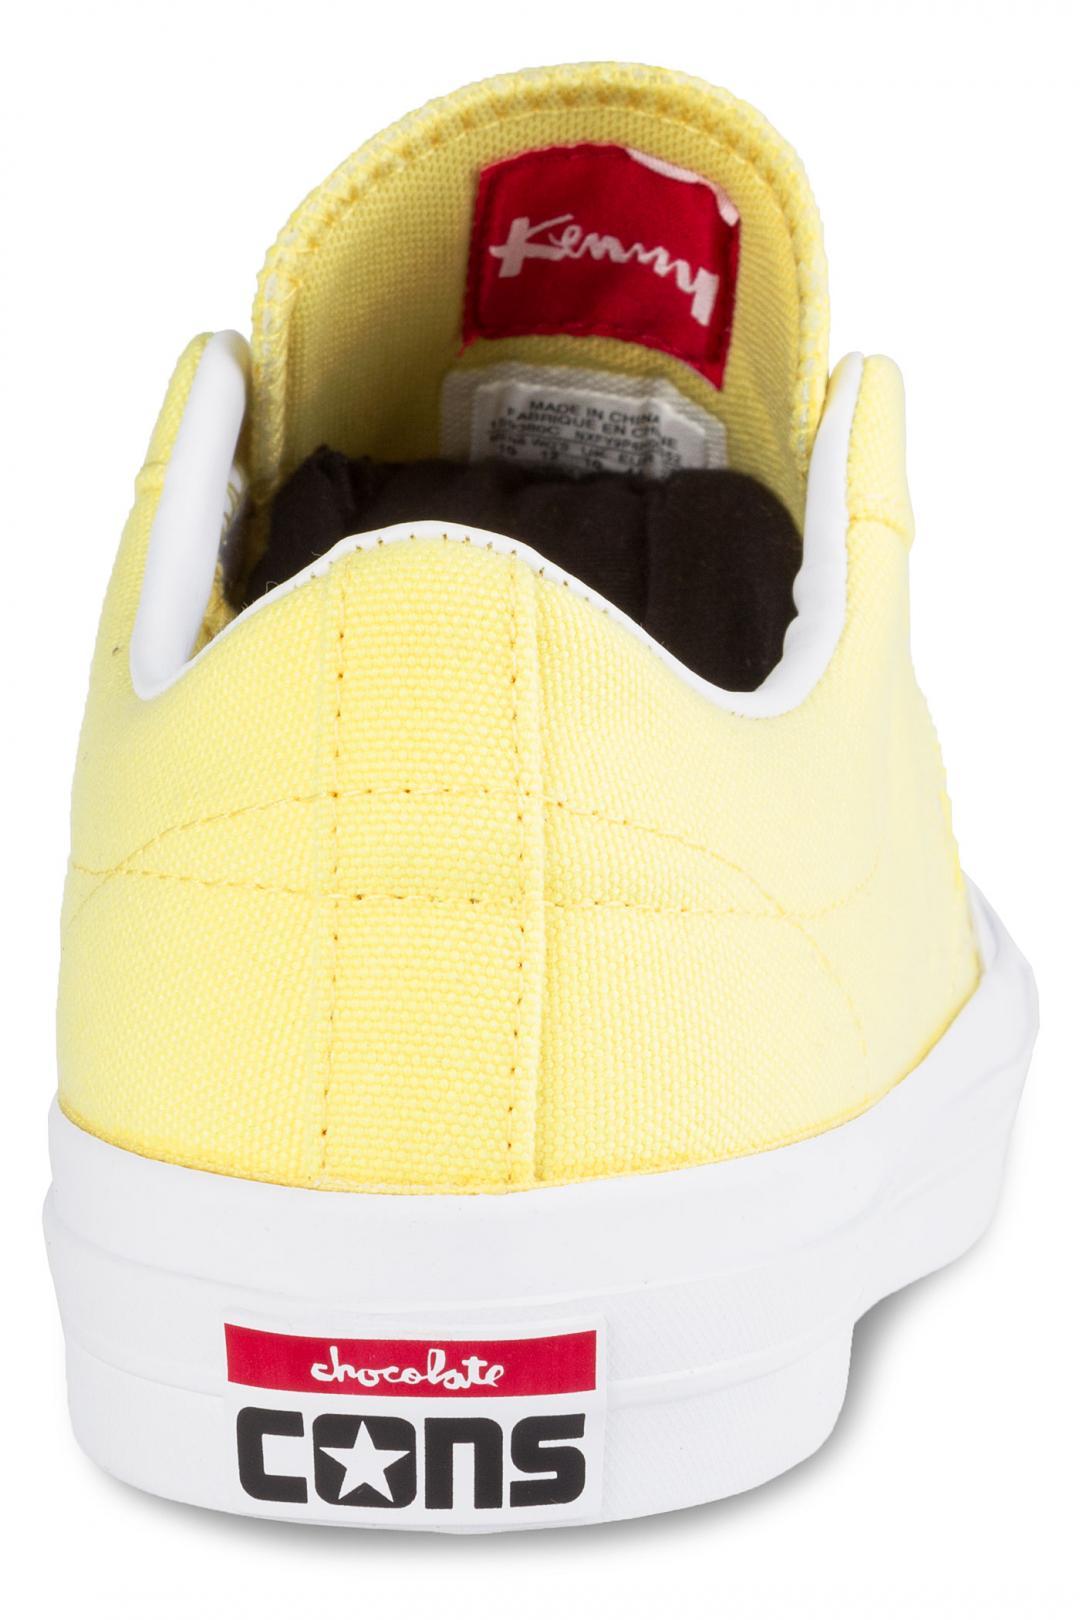 Uomo Converse x Chocolate One Star Pro OX yellow days ahead | Sneaker